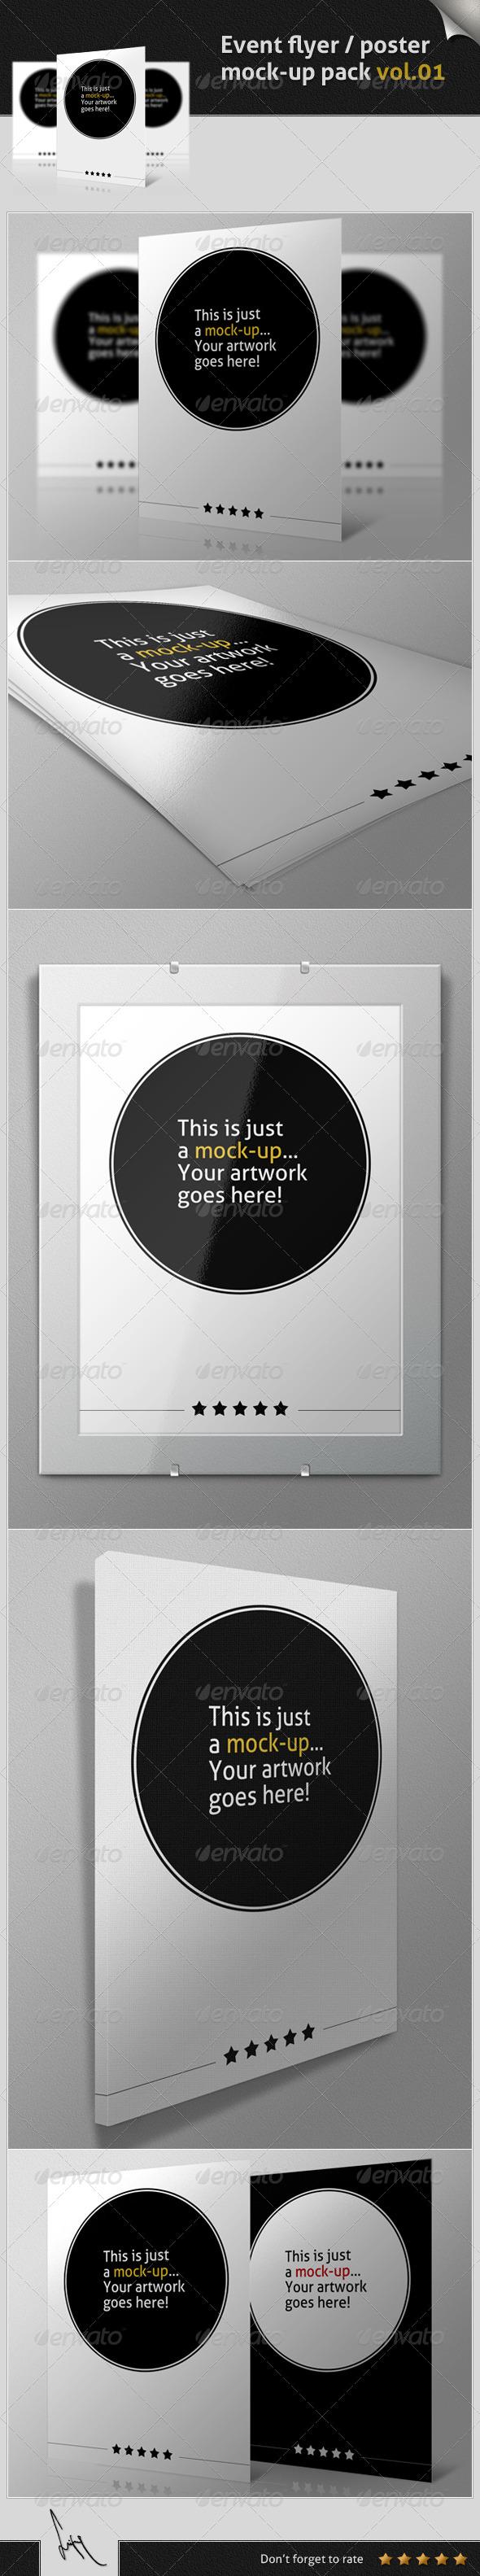 Event Flyer / Poster Mock-up Pack Vol.01 - Flyers Print